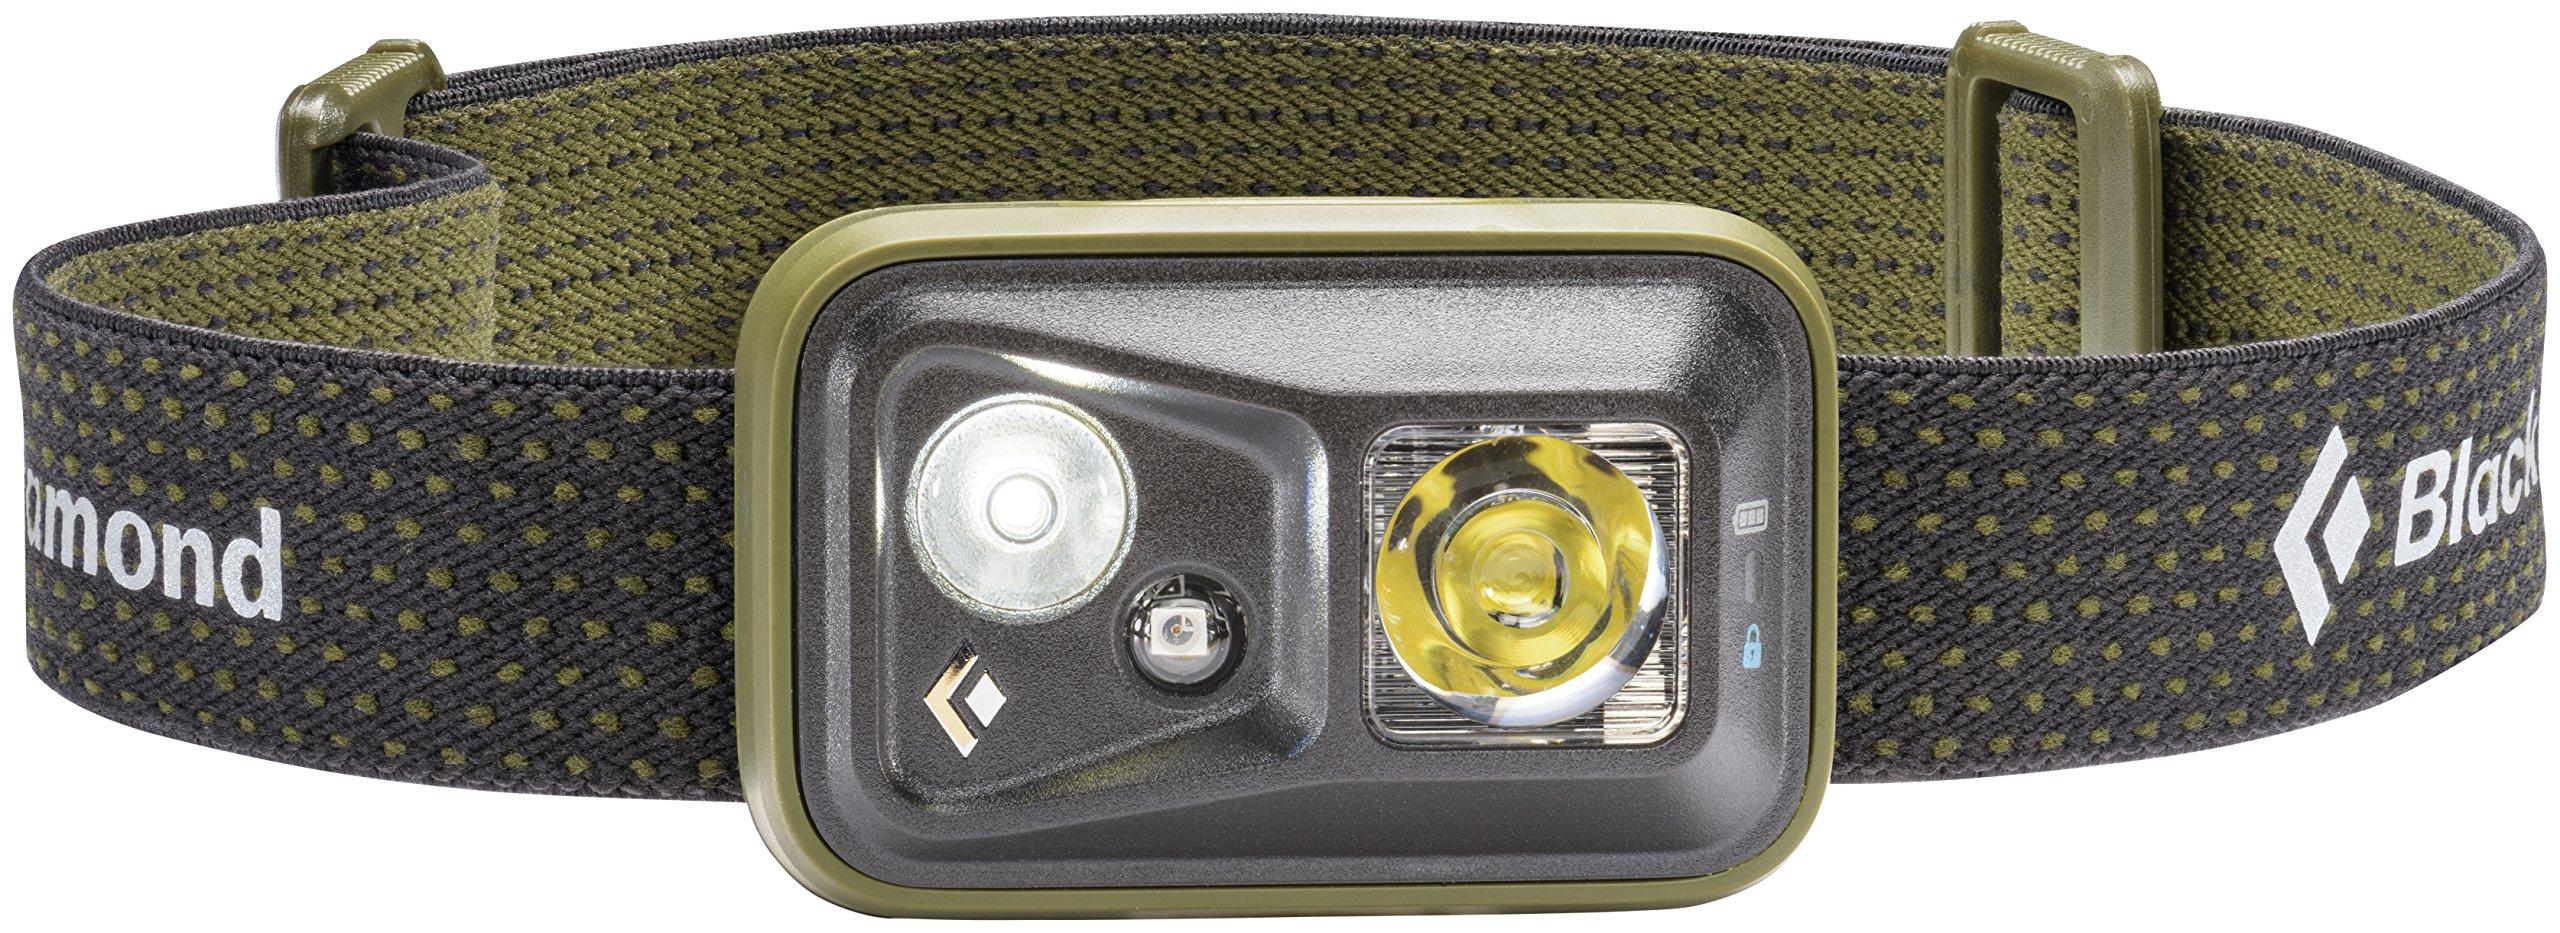 Black Diamond Spot Headlamp, Dark Olive, One Size by Black Diamond